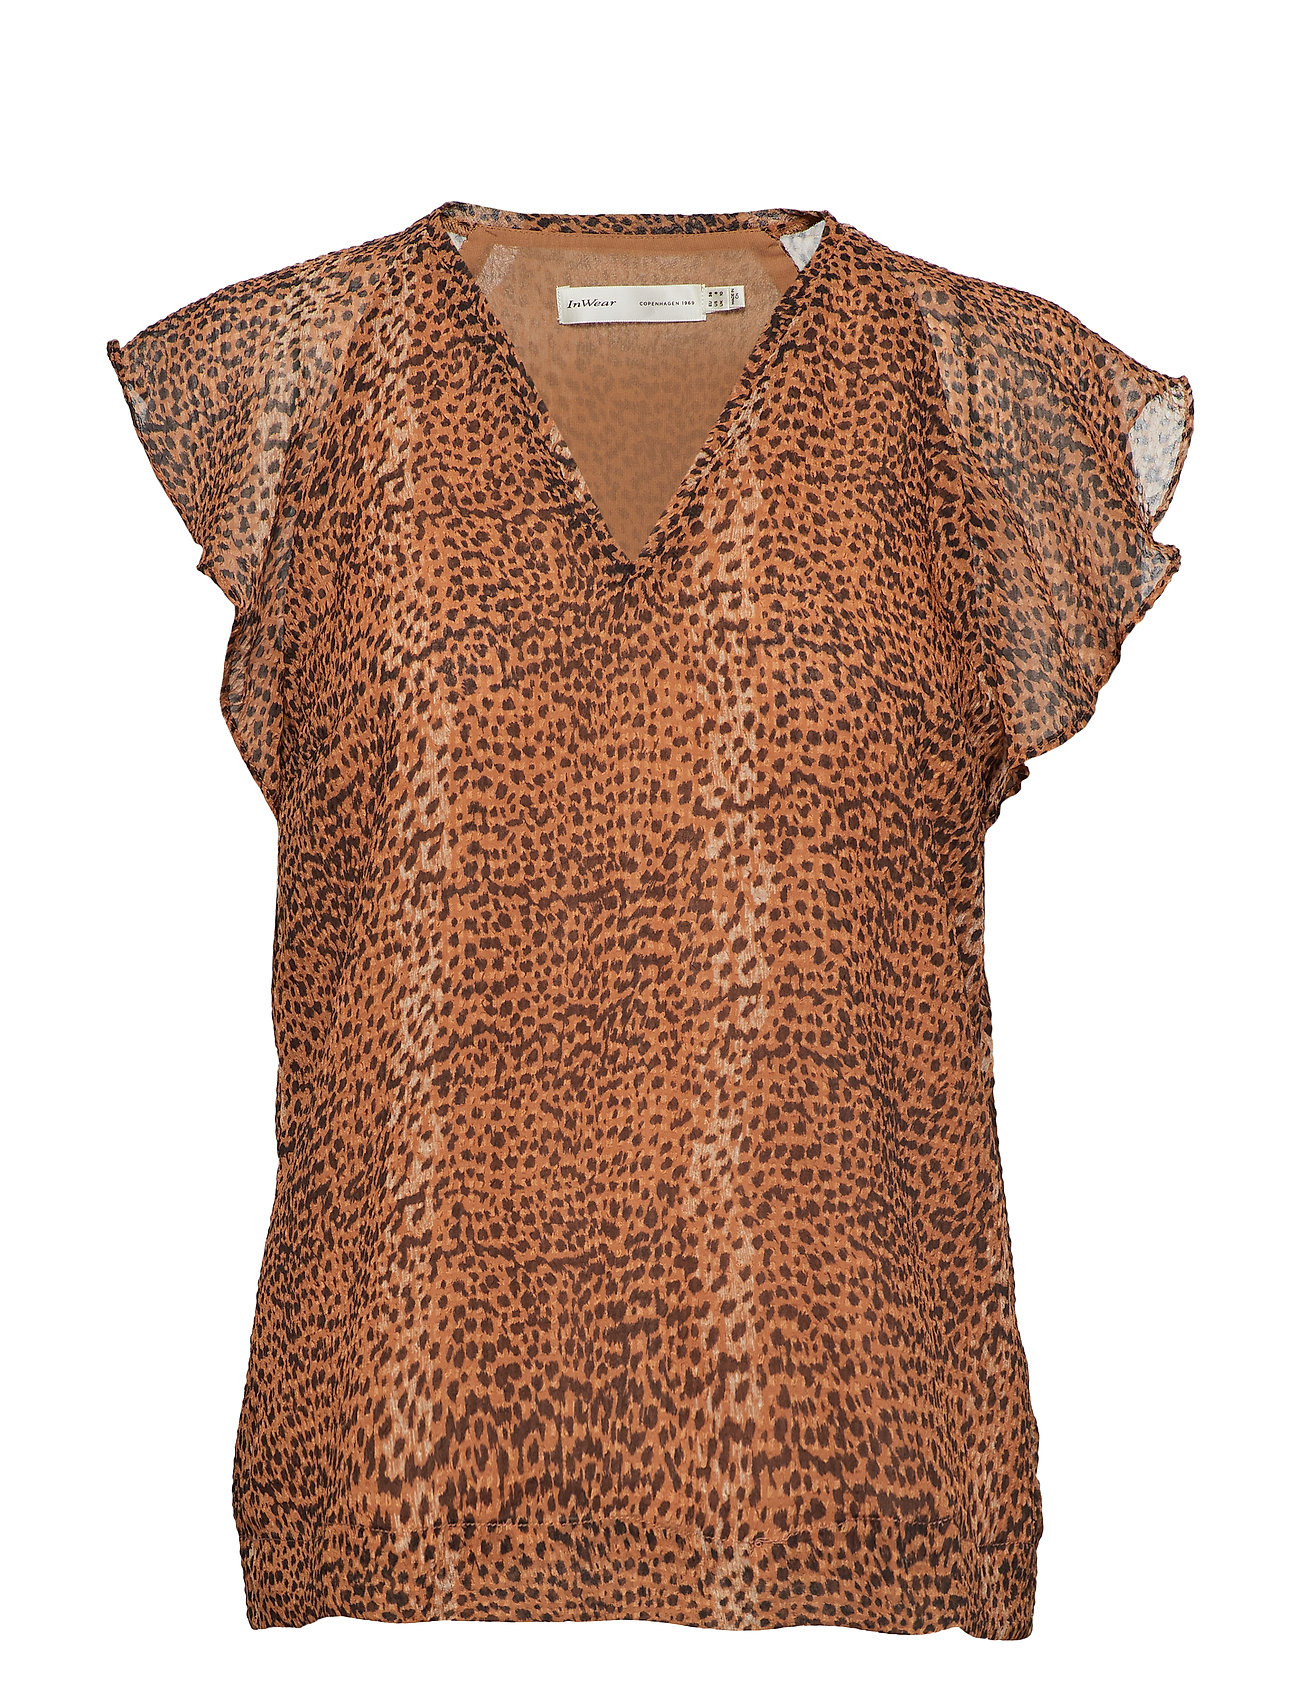 tanyaiw top  light brown animal   560 kr